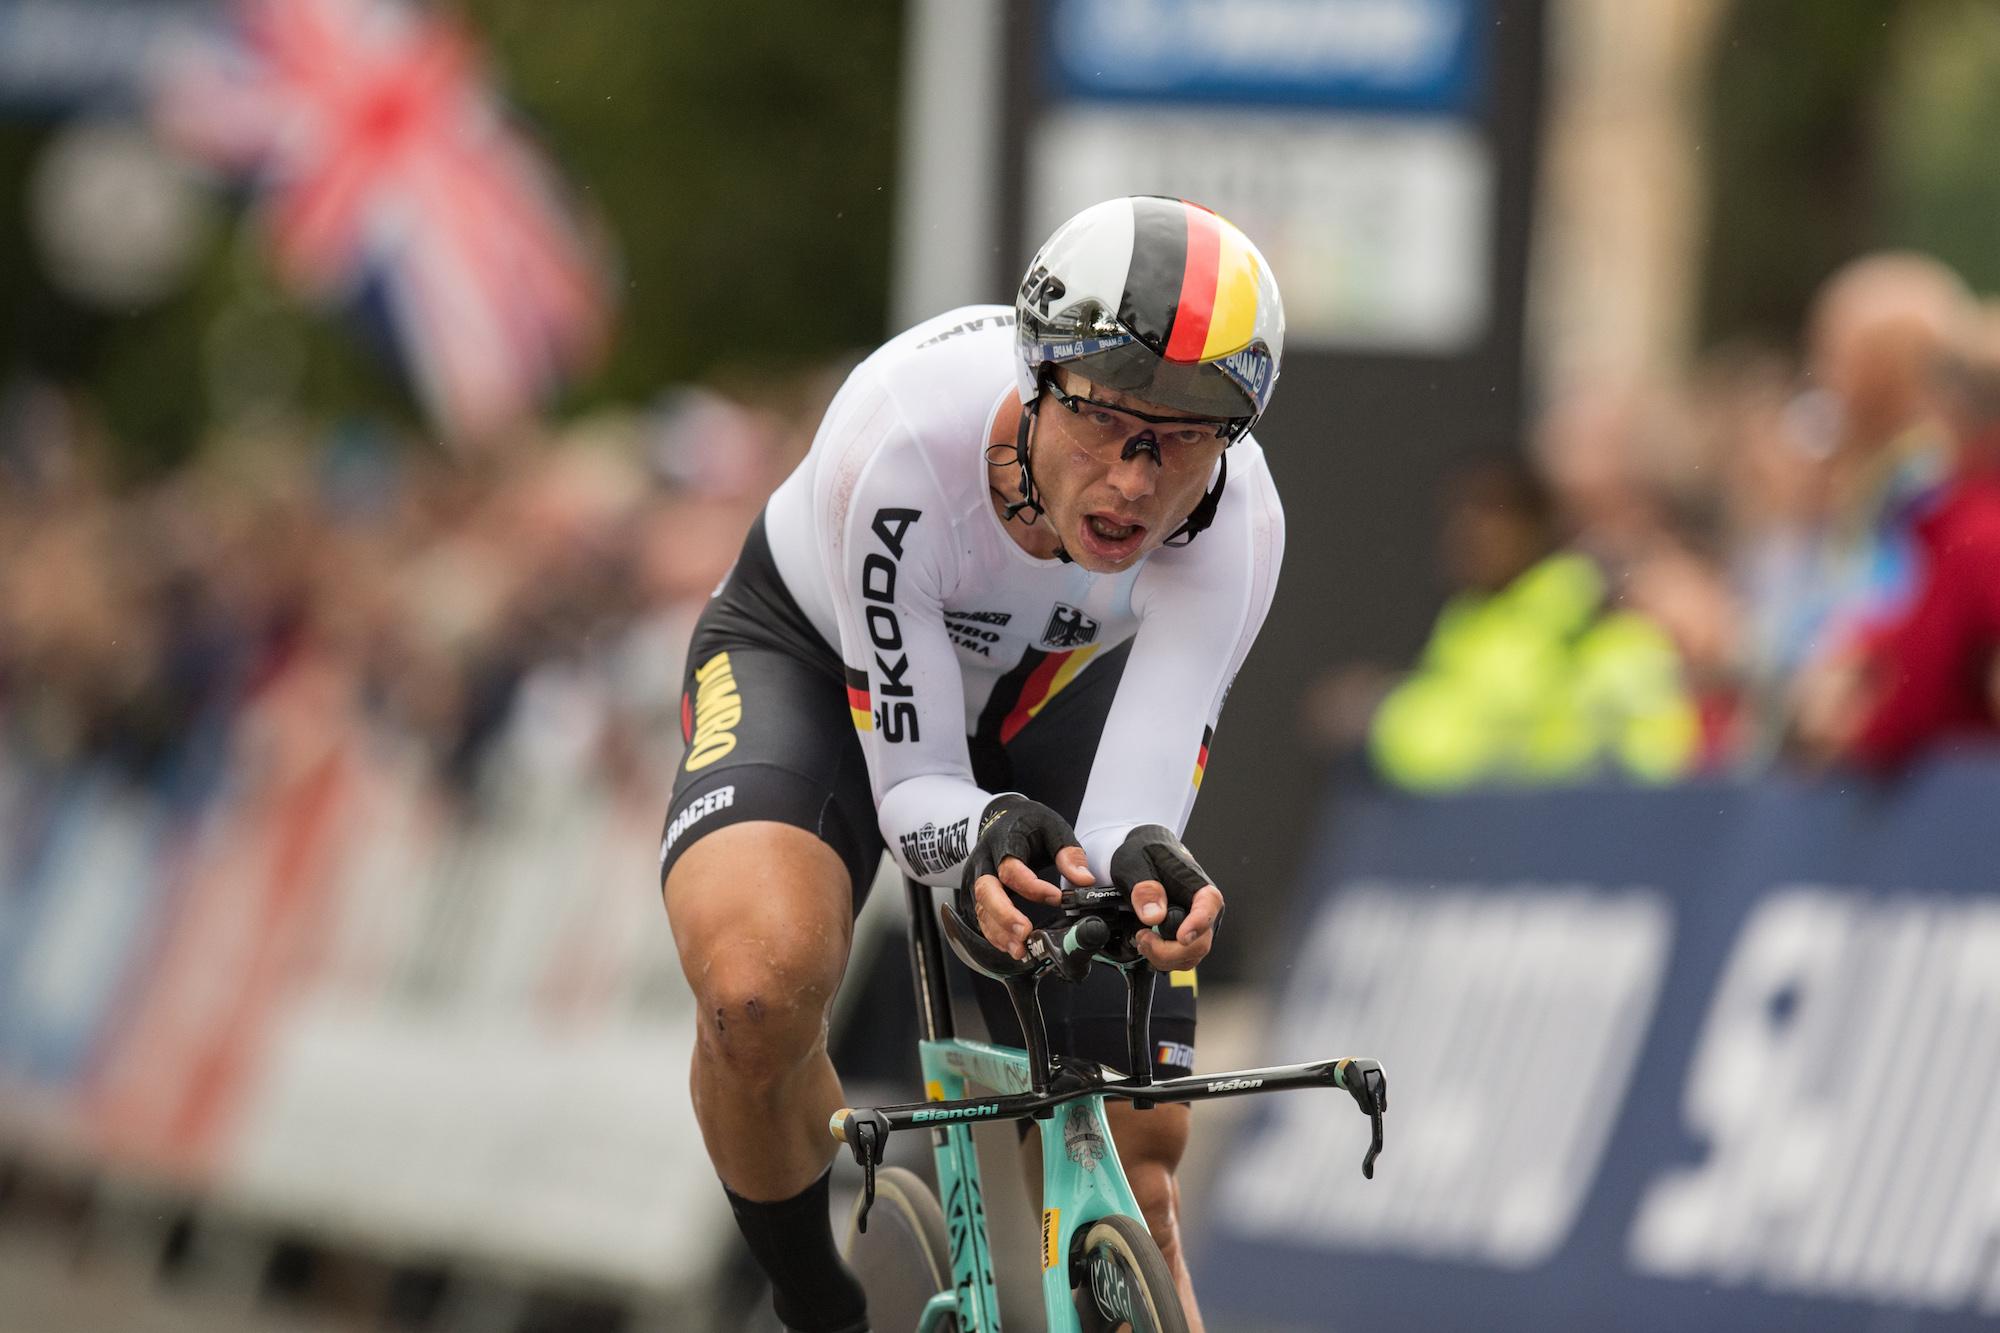 Tony Martin won't target time trial gold at Tokyo 2020